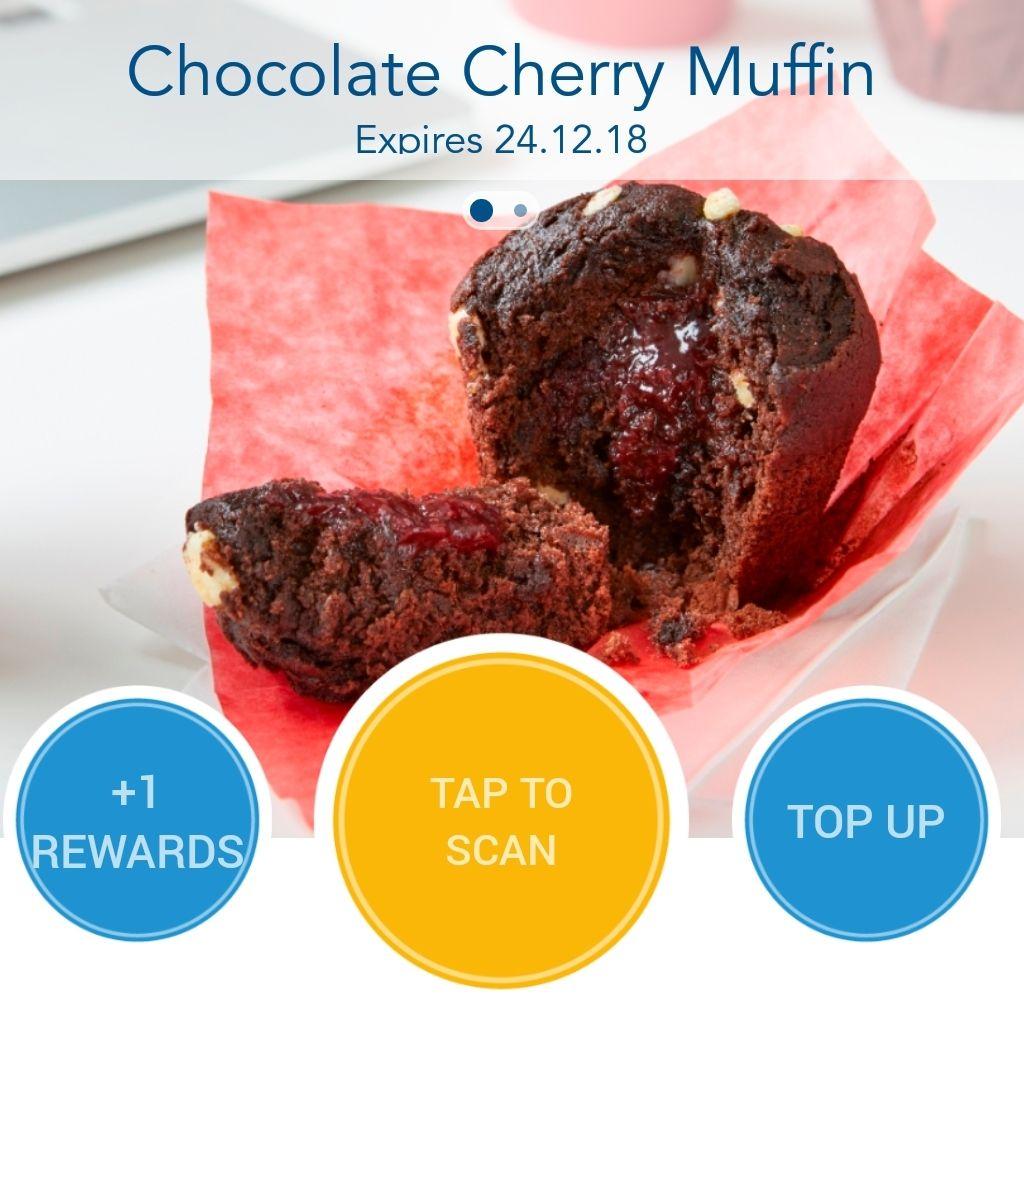 Free Chocolate Cherry Muffin on Greggs rewards